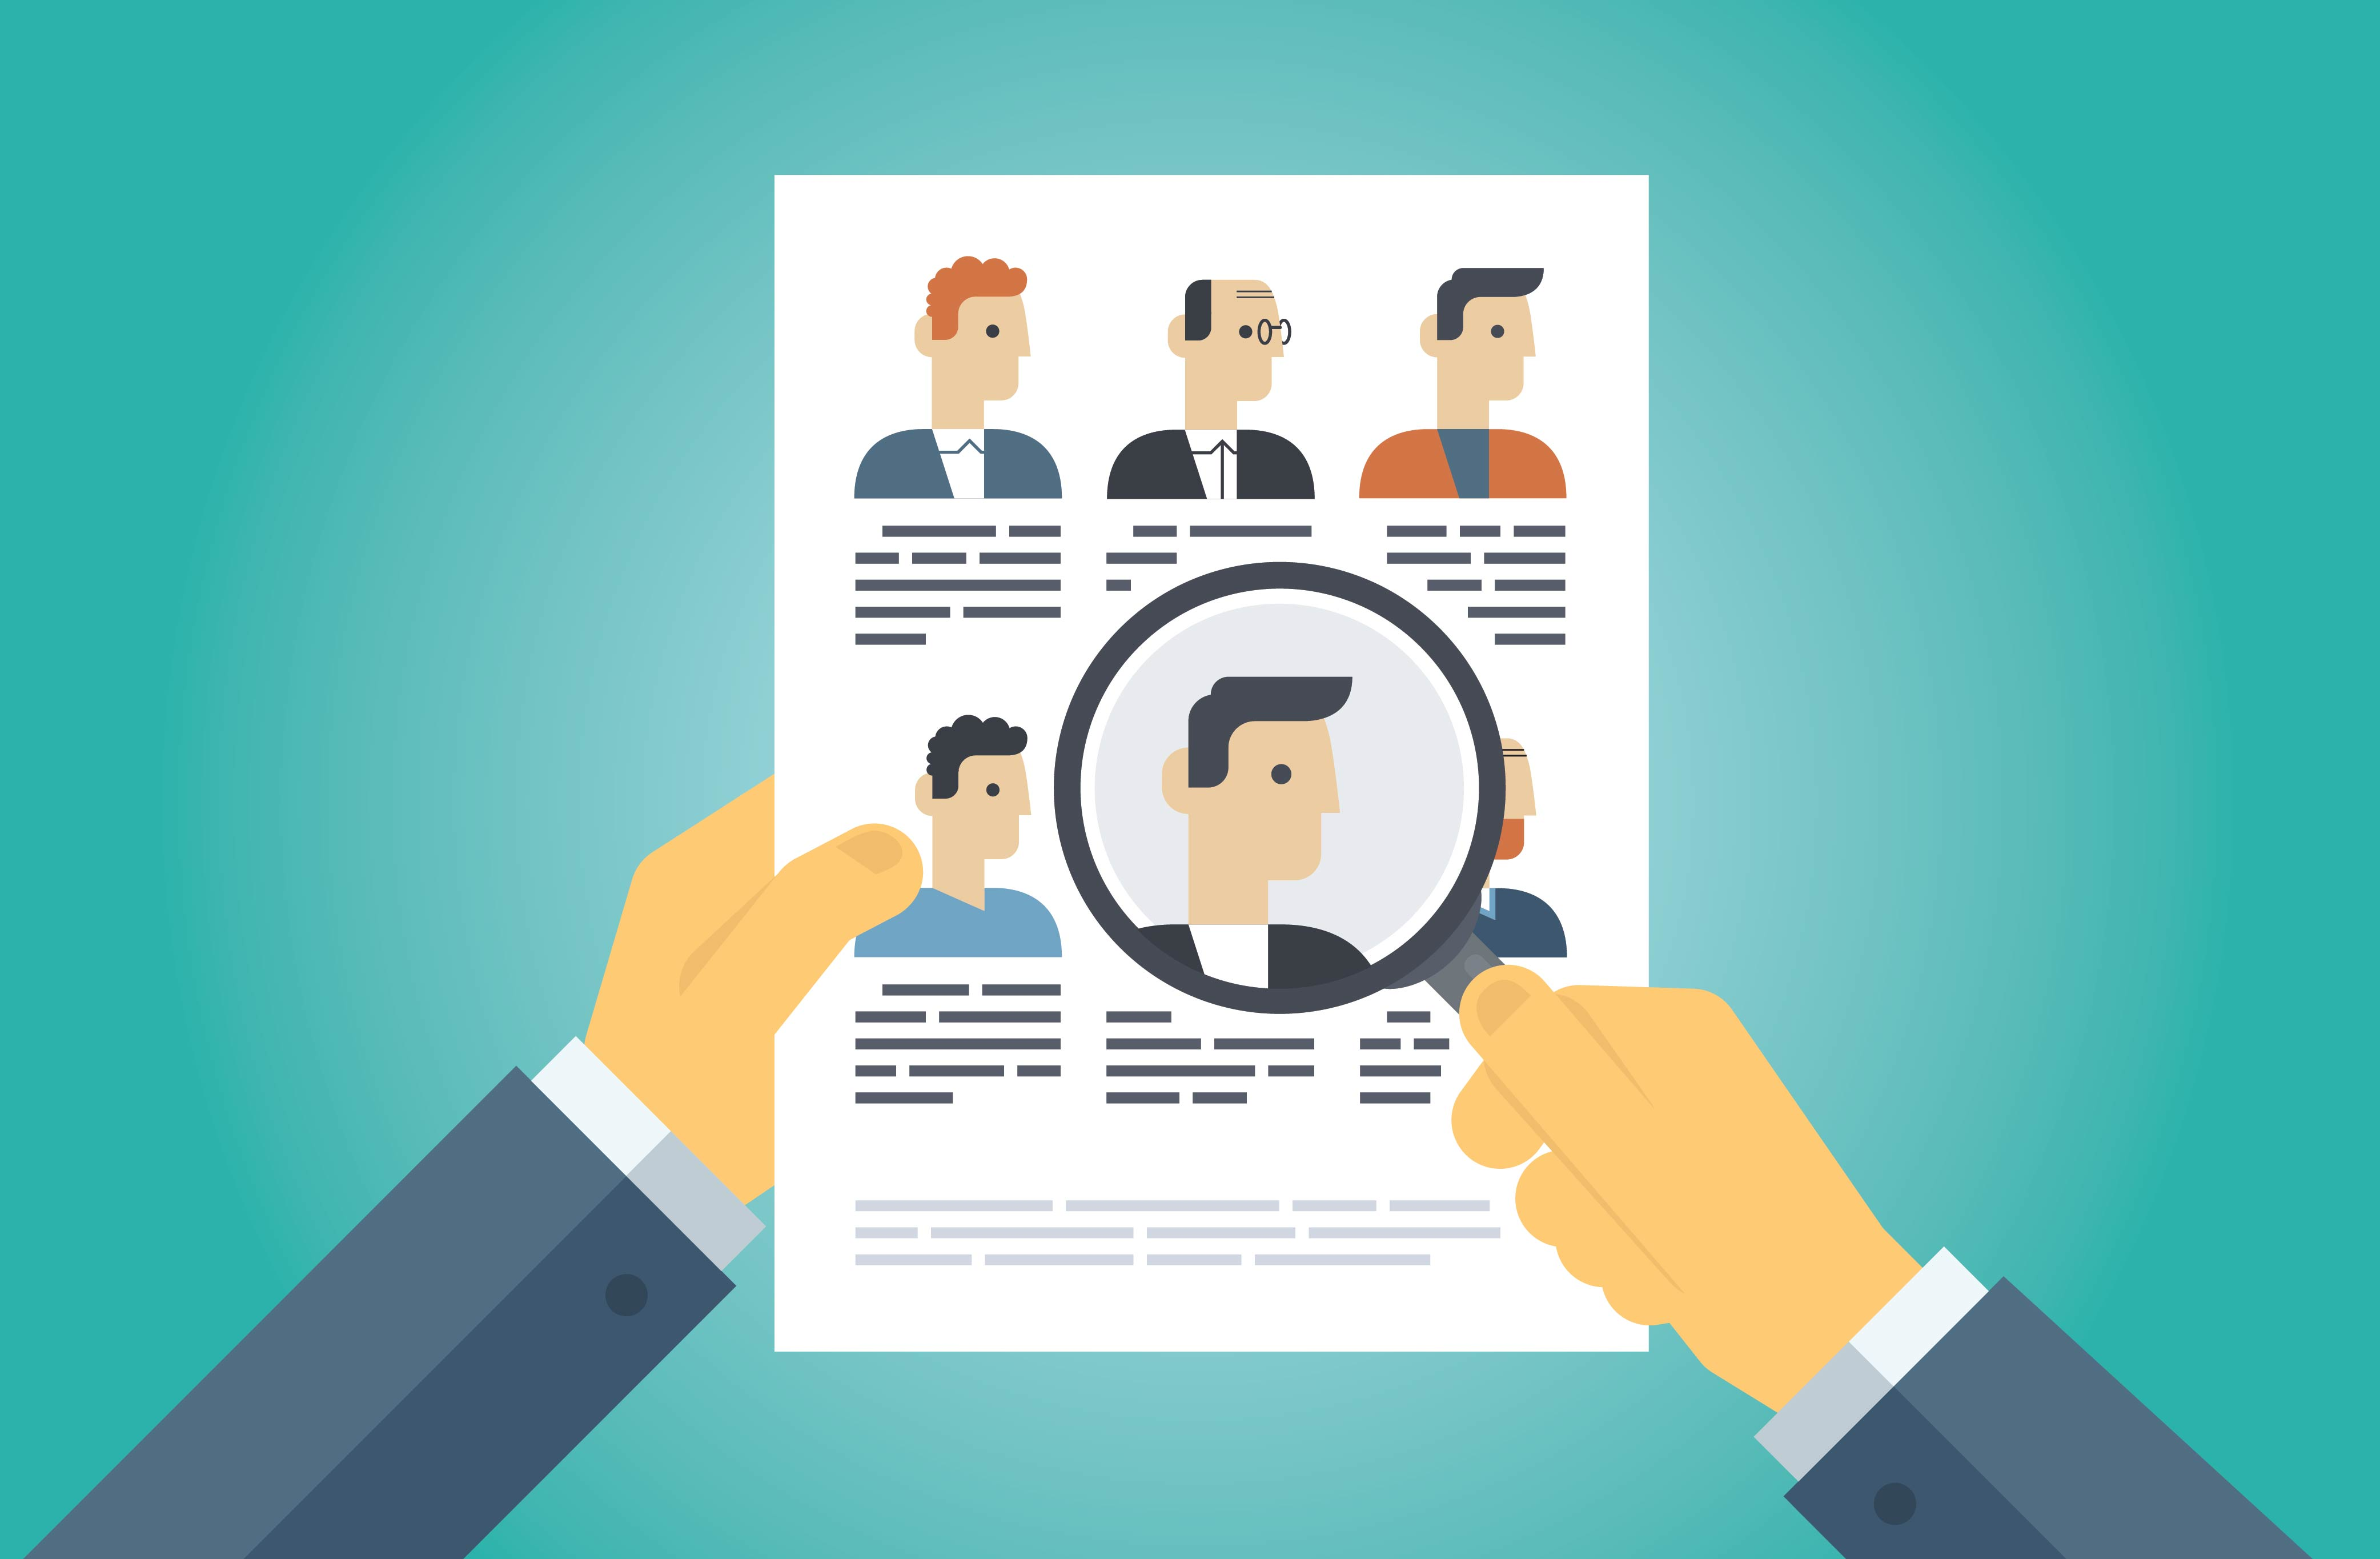 09.28.16-Importance-Explaining-Vendor-Management-team-qualifications-FEATURED.jpg